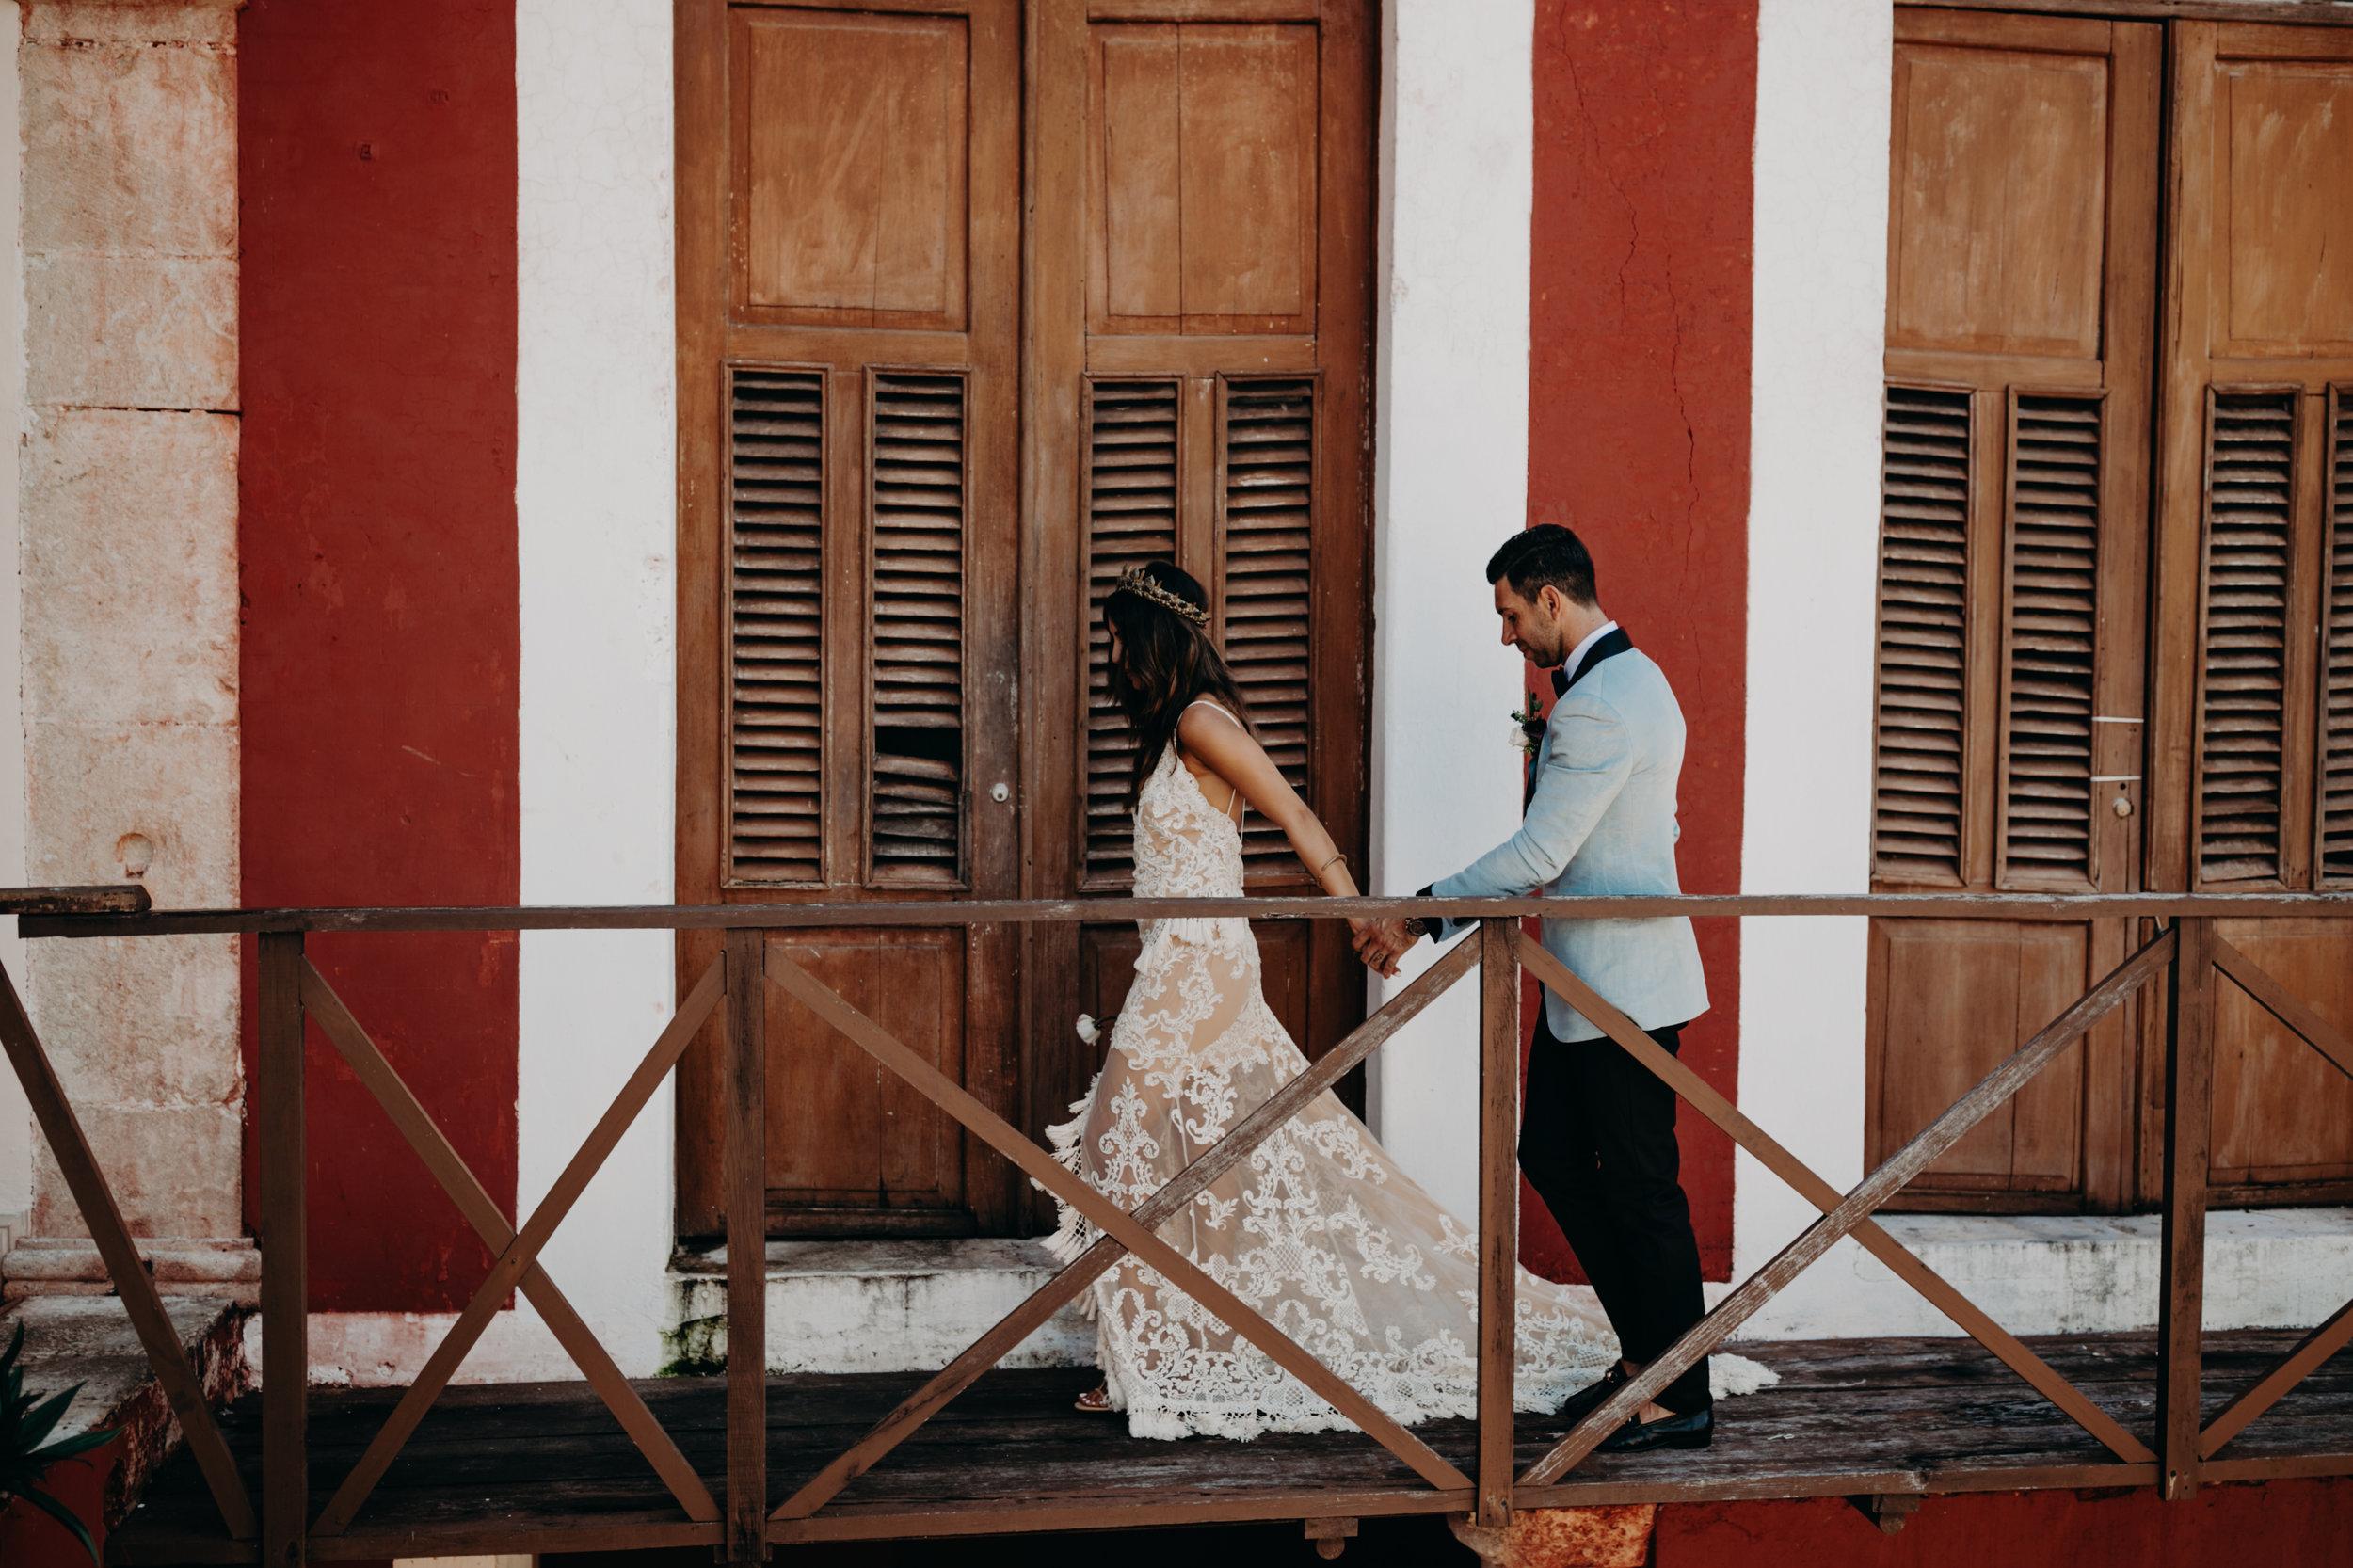 Hacienda Temozon Yucatan Mexico Wedding | Ida & Peter Emily Magers Photography-649.jpg